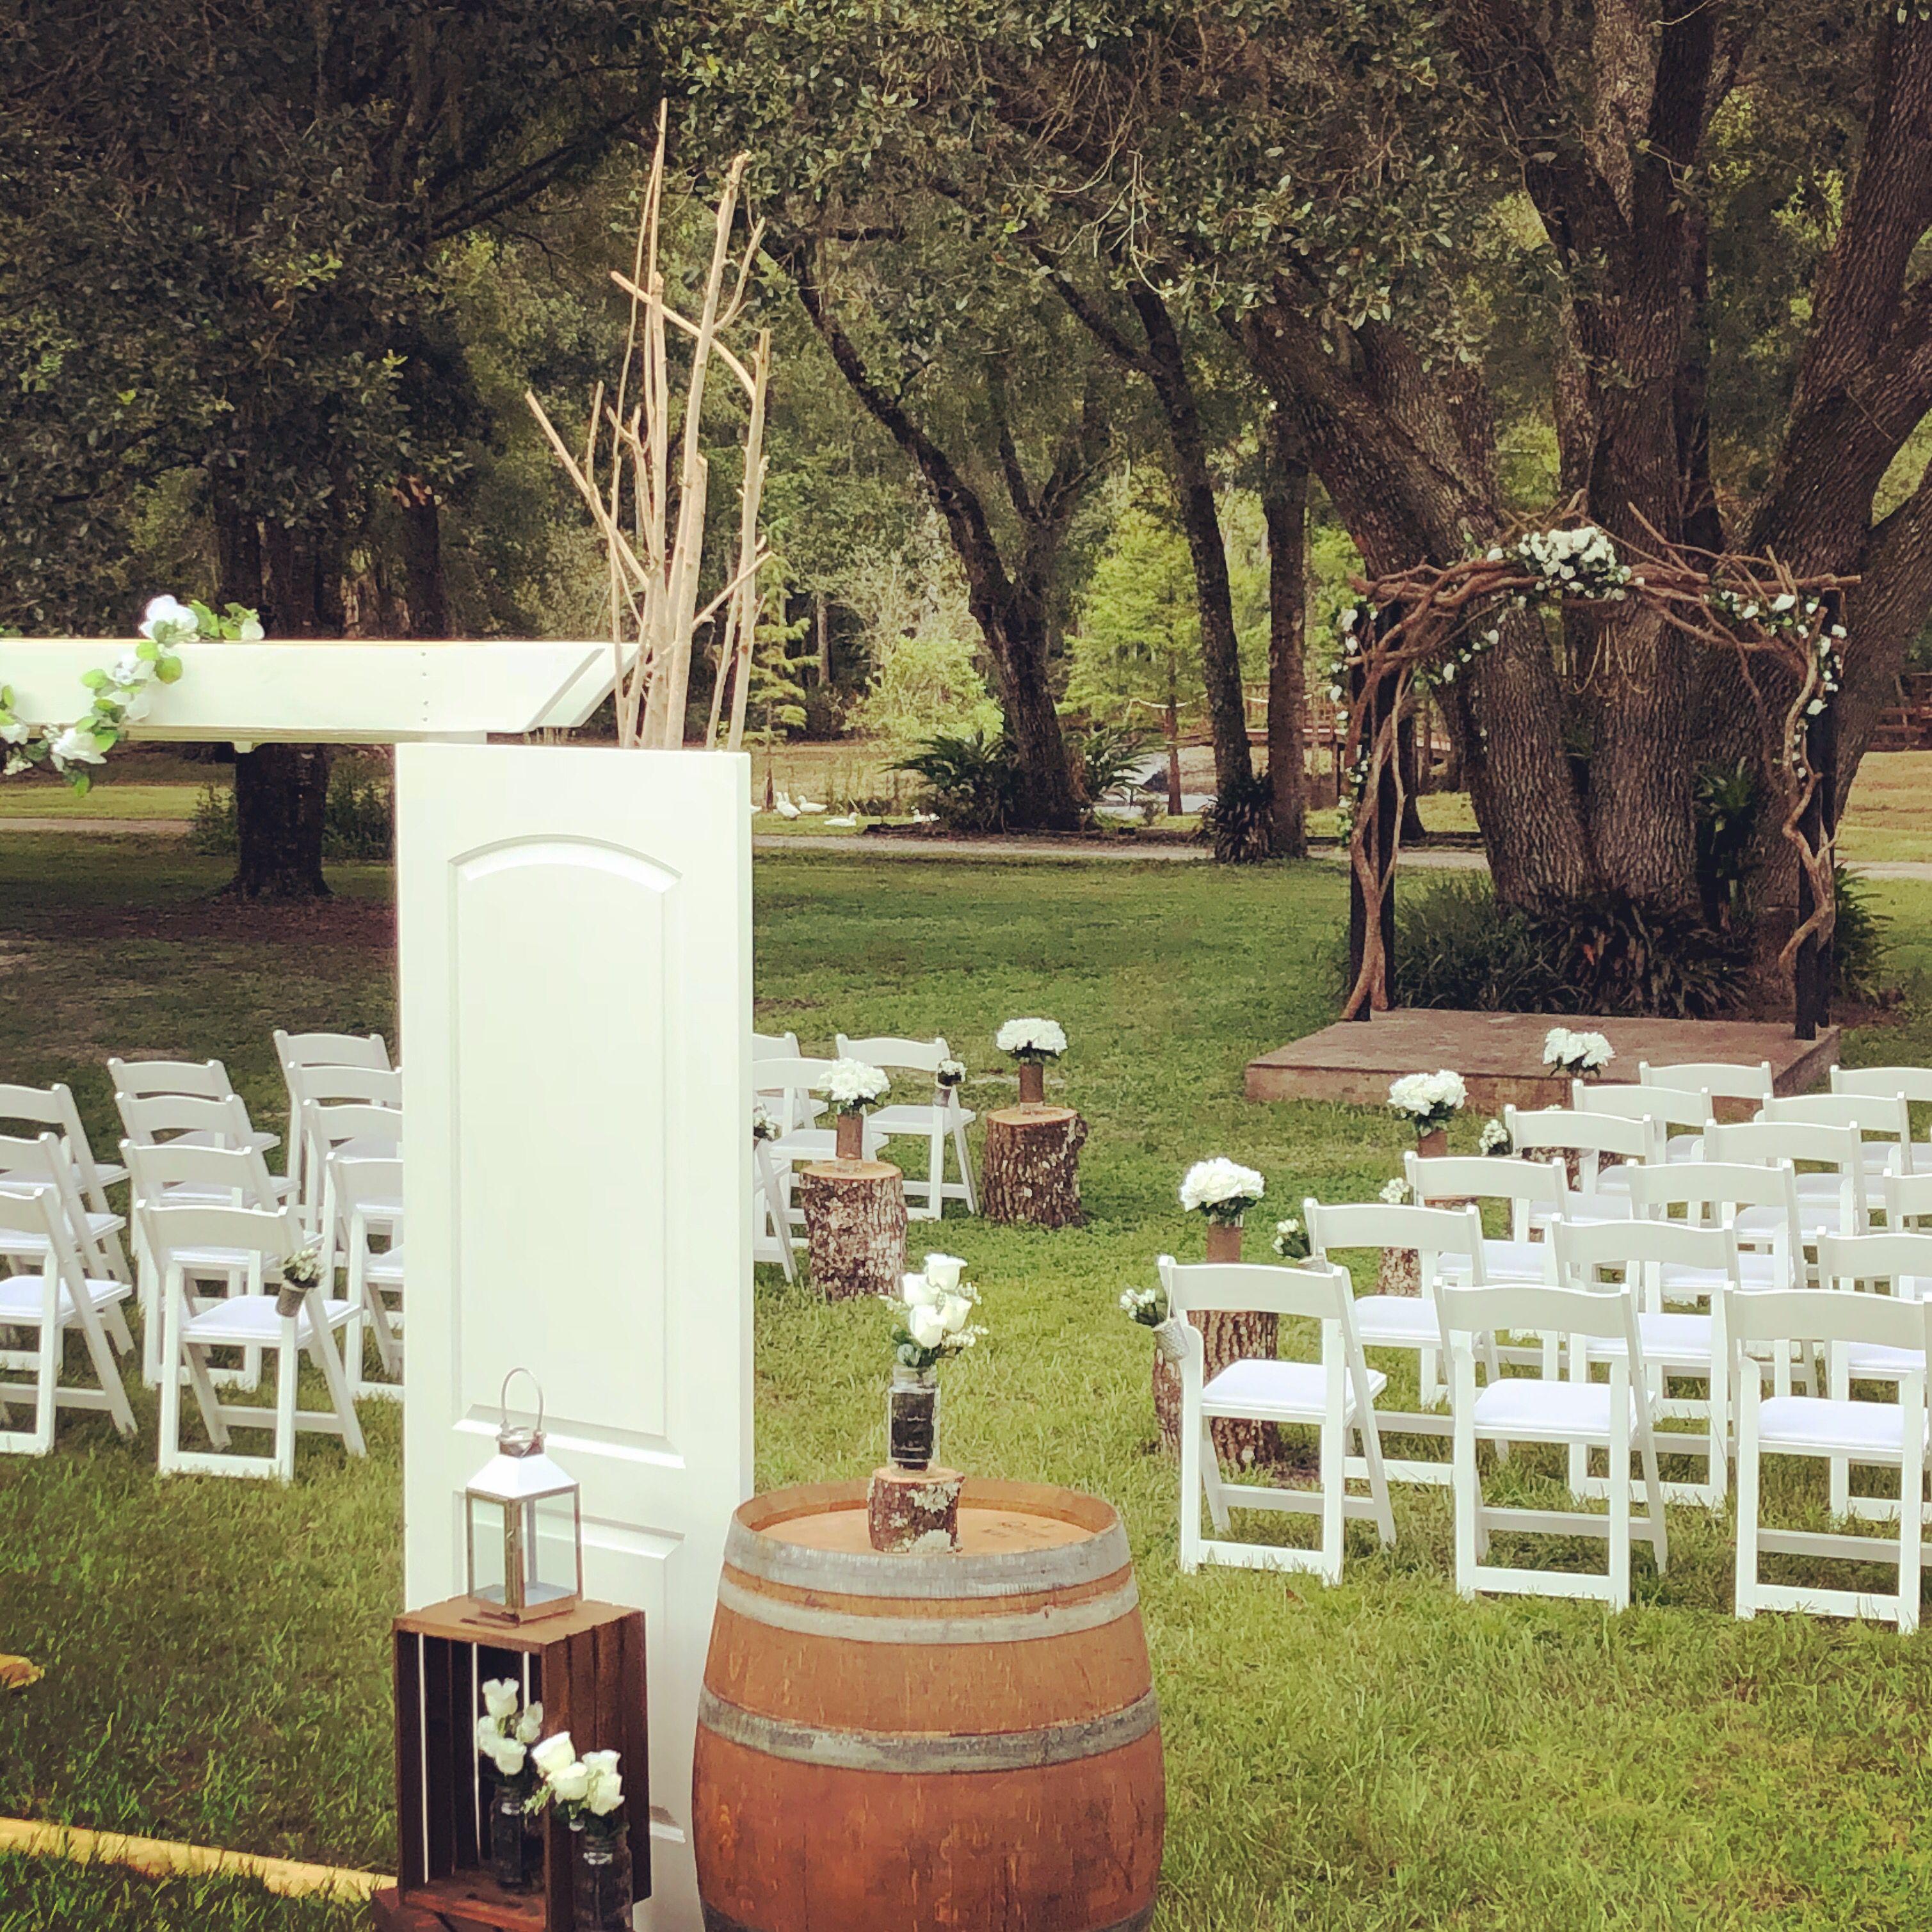 Ceremony at Cypress Creek Event Venue Rustic elegance ...